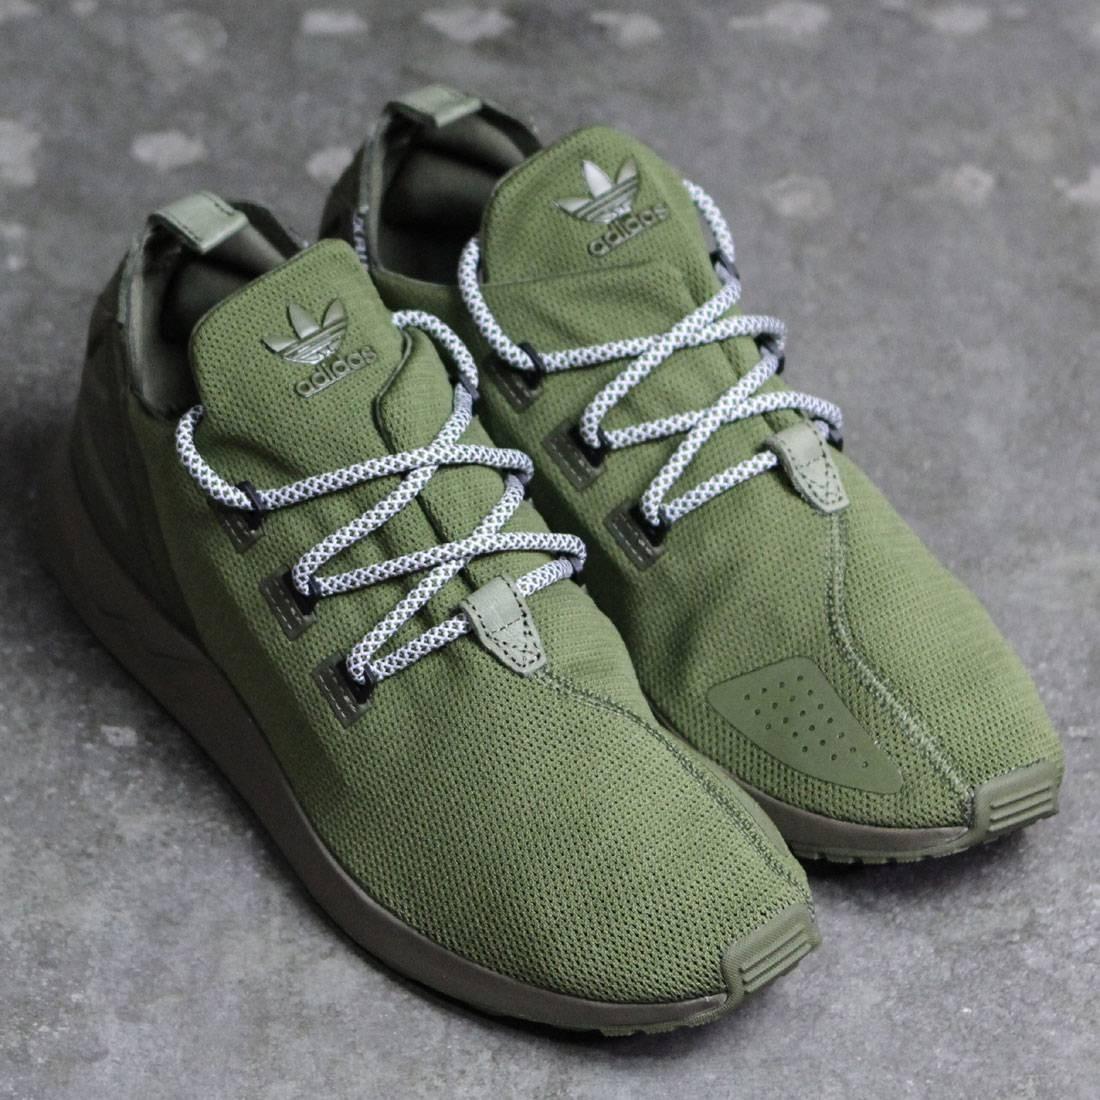 timeless design 8d3eb 53bac ... Adidas Men ZX Flux ADV X (olive   olive cargo   core black   footwear  ...